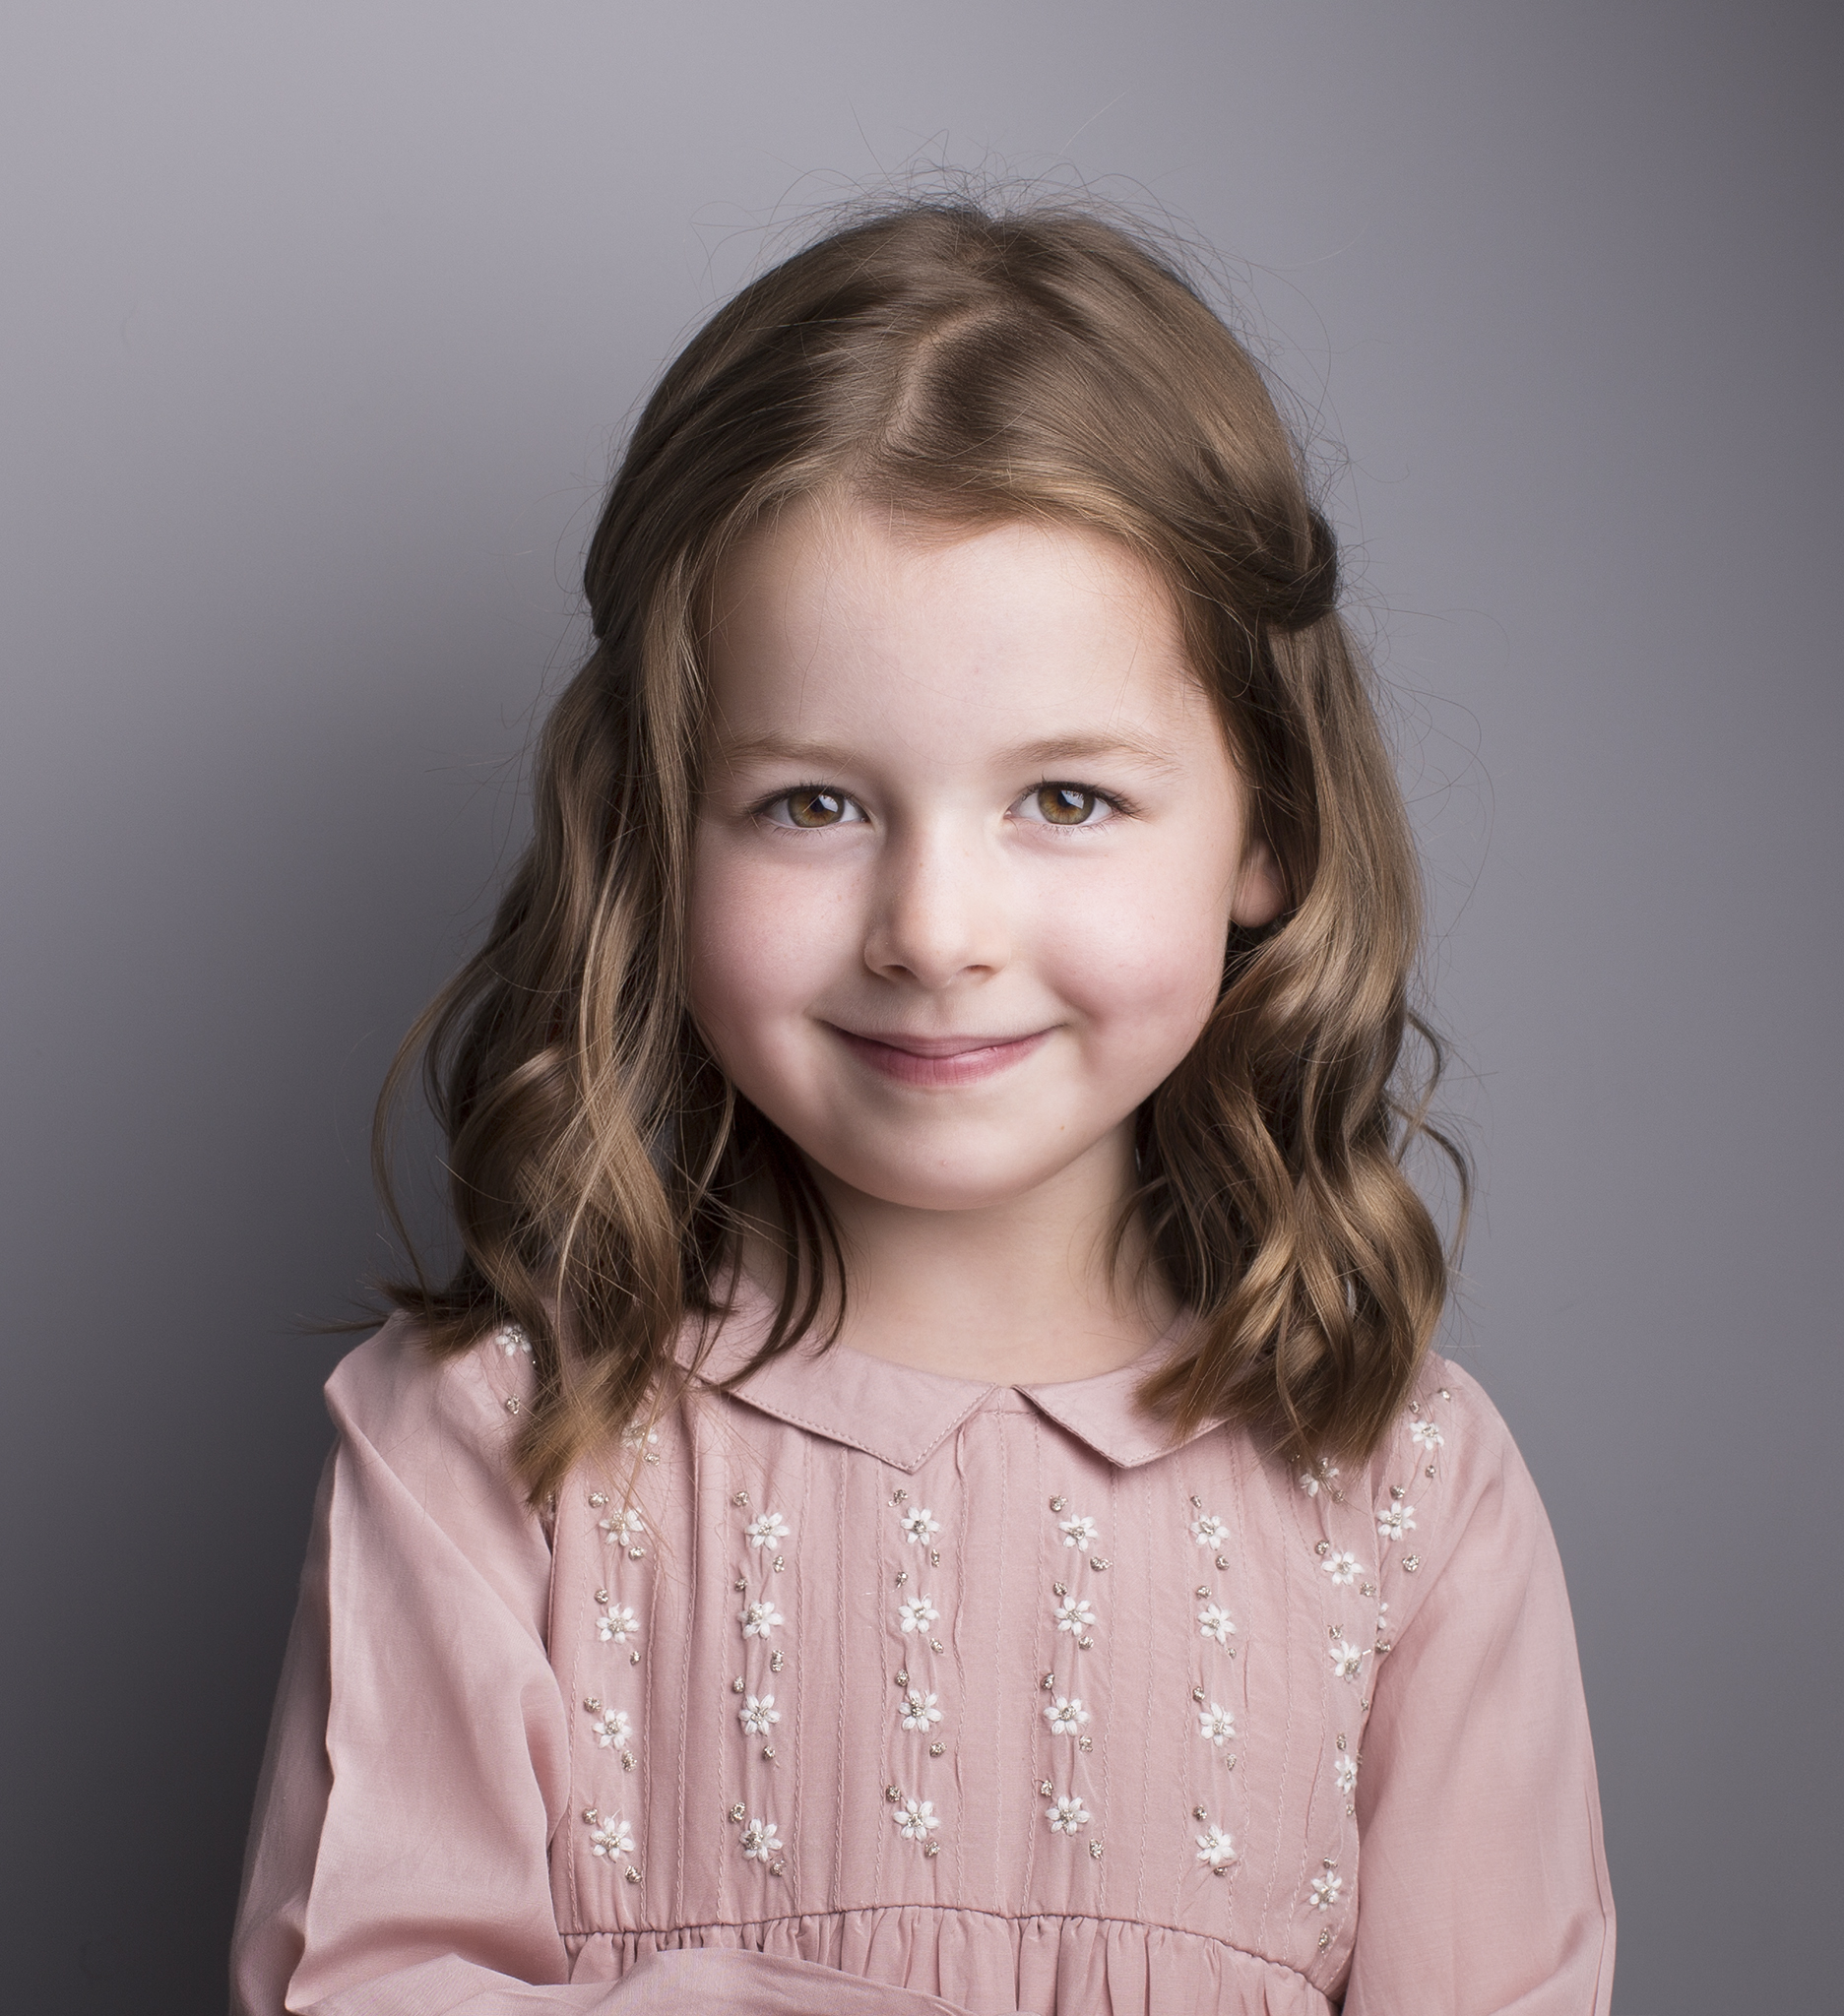 elizabethgphotography_fineart_kingslangley_hertfordshire_child_model_amelia_2.jpg